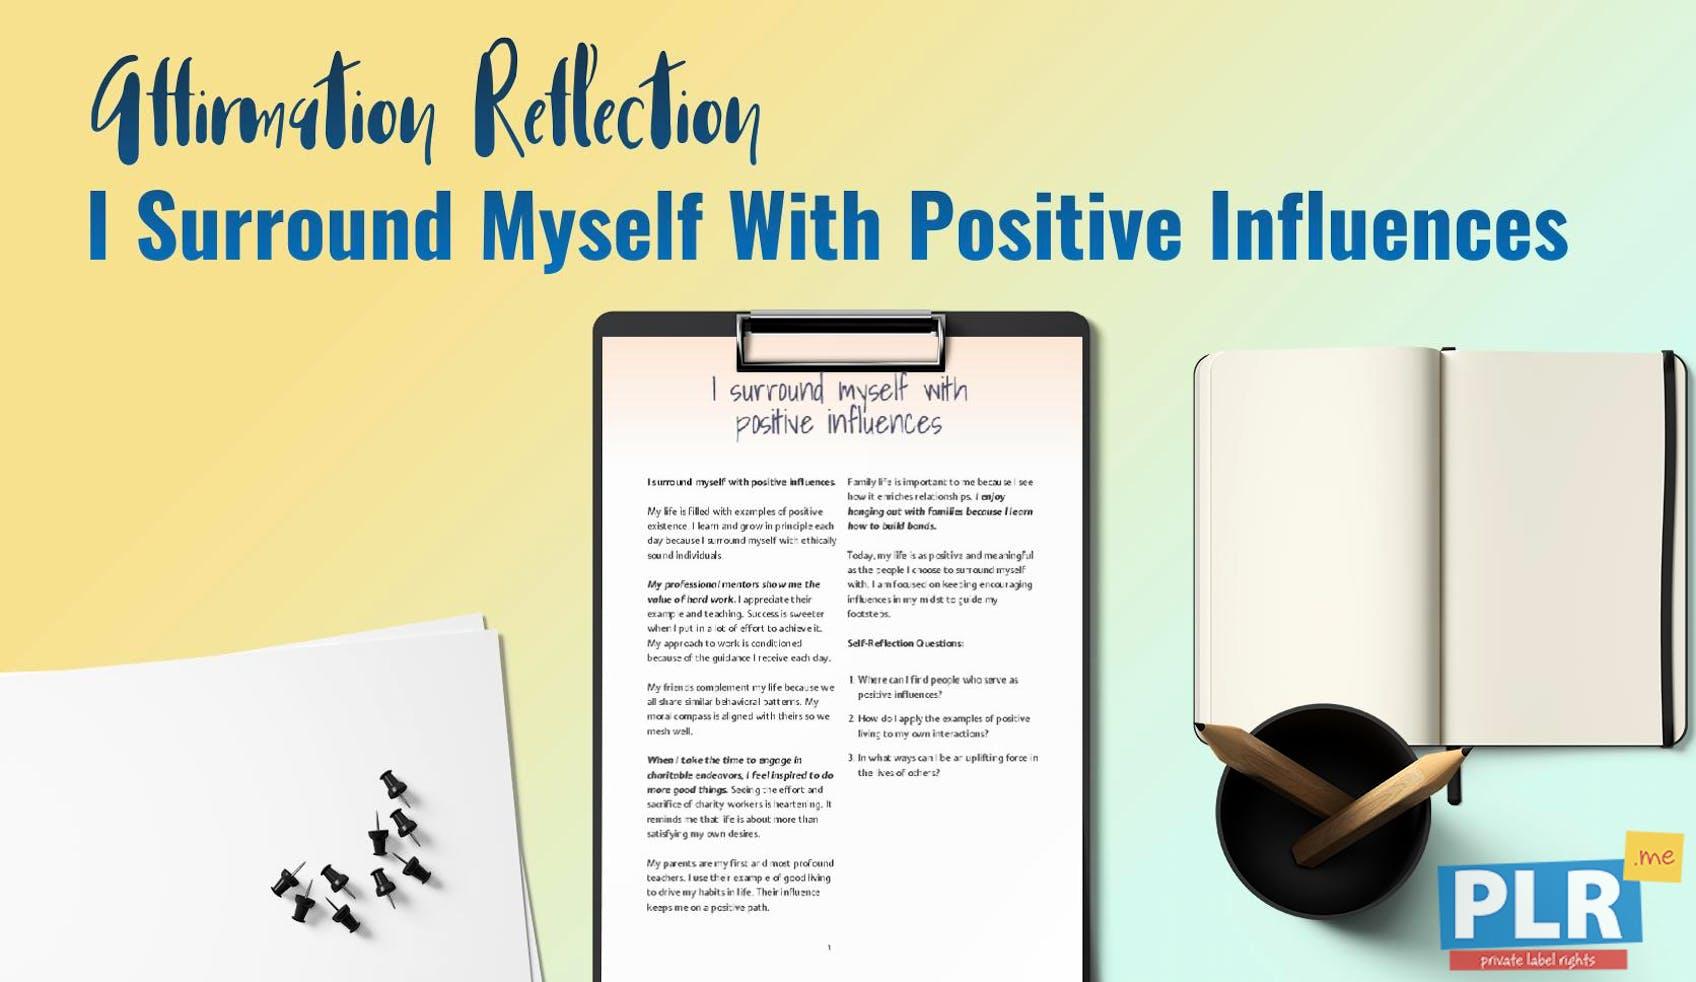 I Surround Myself With Positive Influences